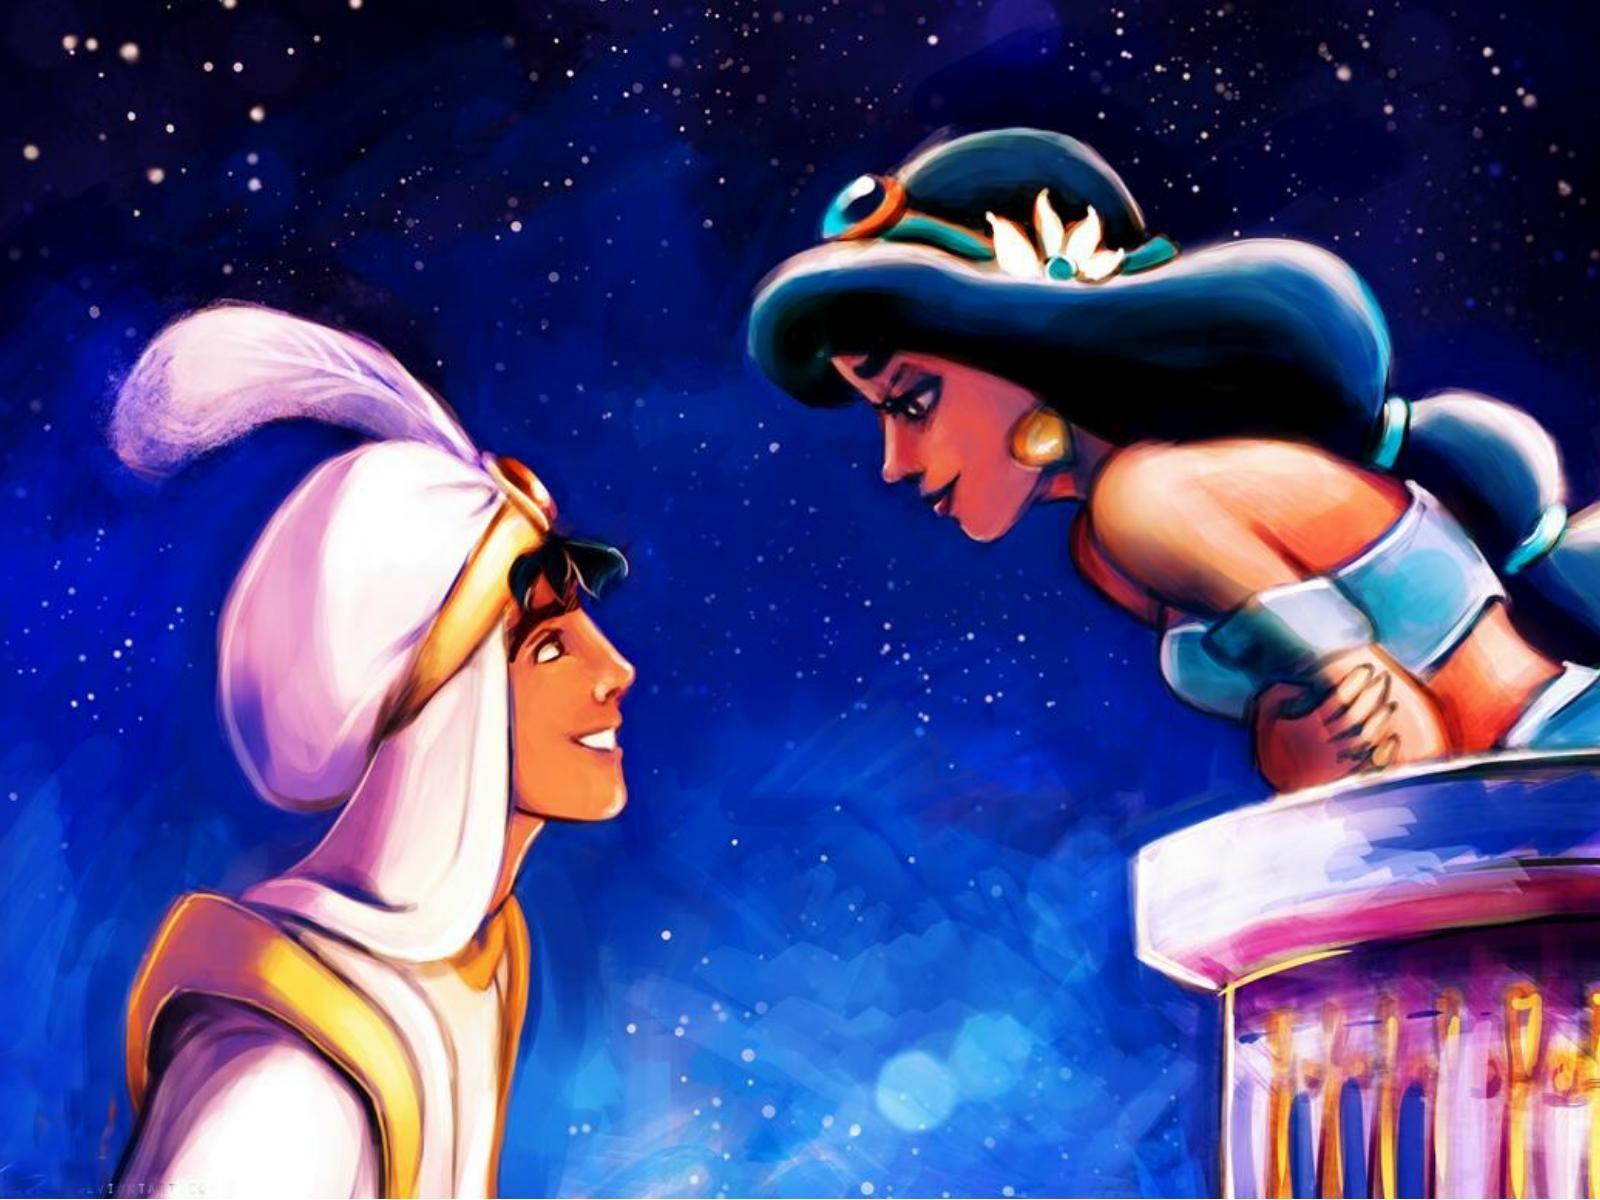 Aladdin Cartoon Wallpaper For Desktop Free To Download